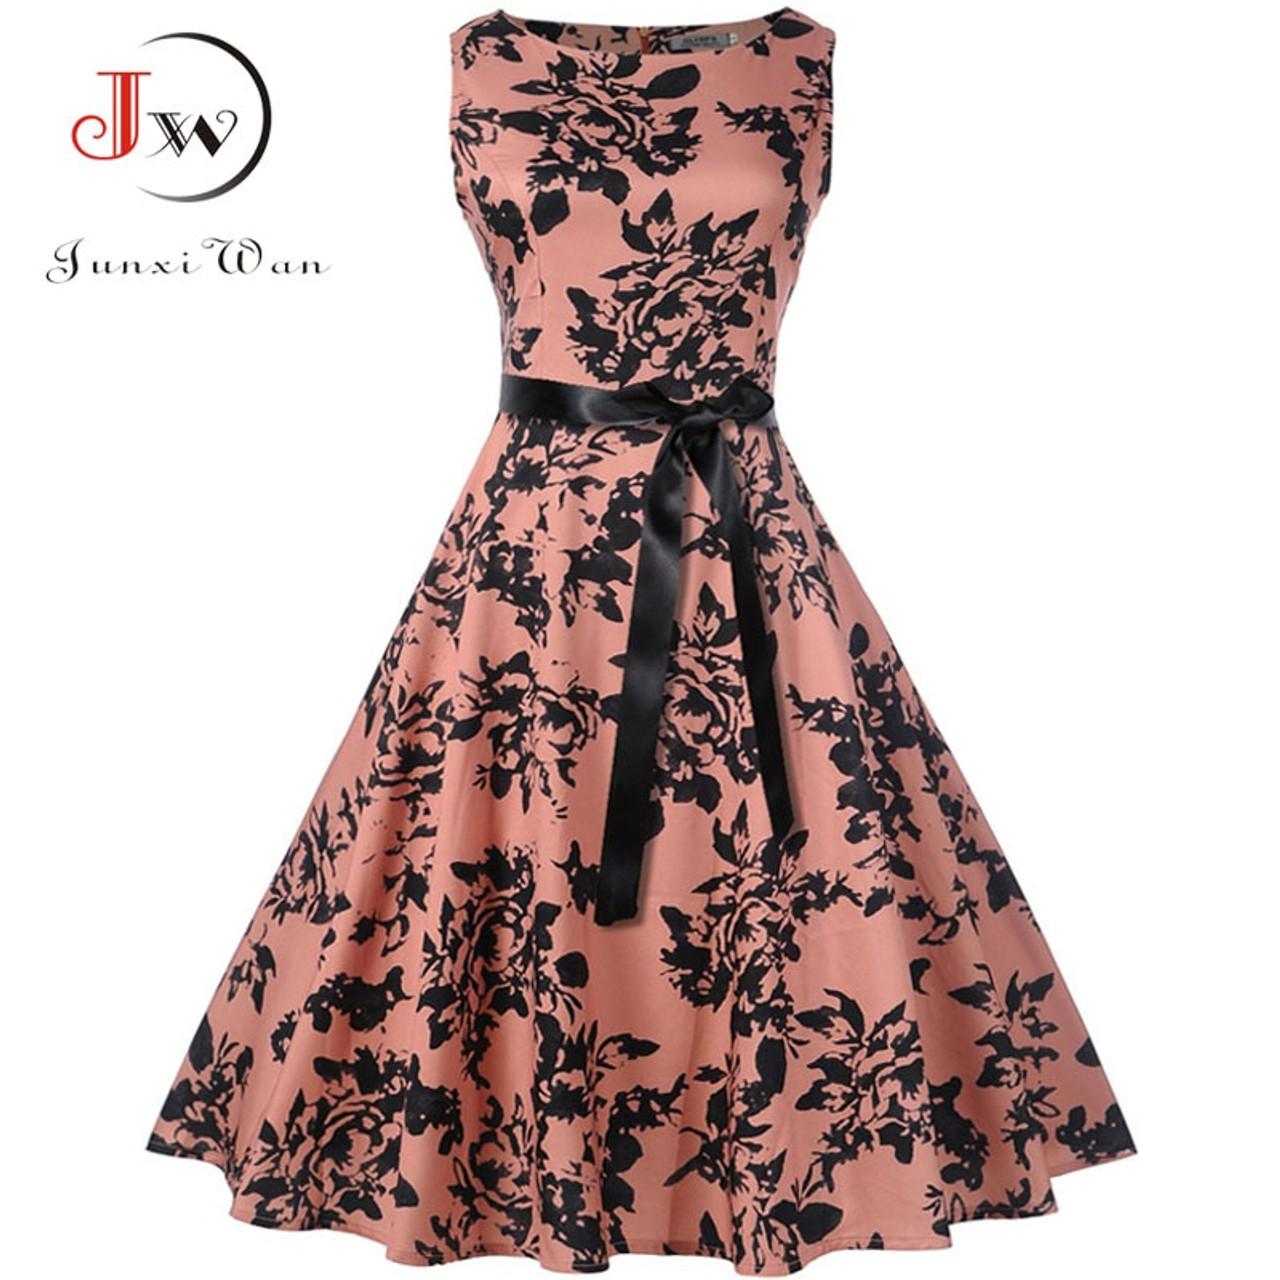 5ef7029fc Plus Size Summer Dress 2018 Women Vintage Rockabilly Dresses Jurken Floral  50s 60s Retro Big Swing ...